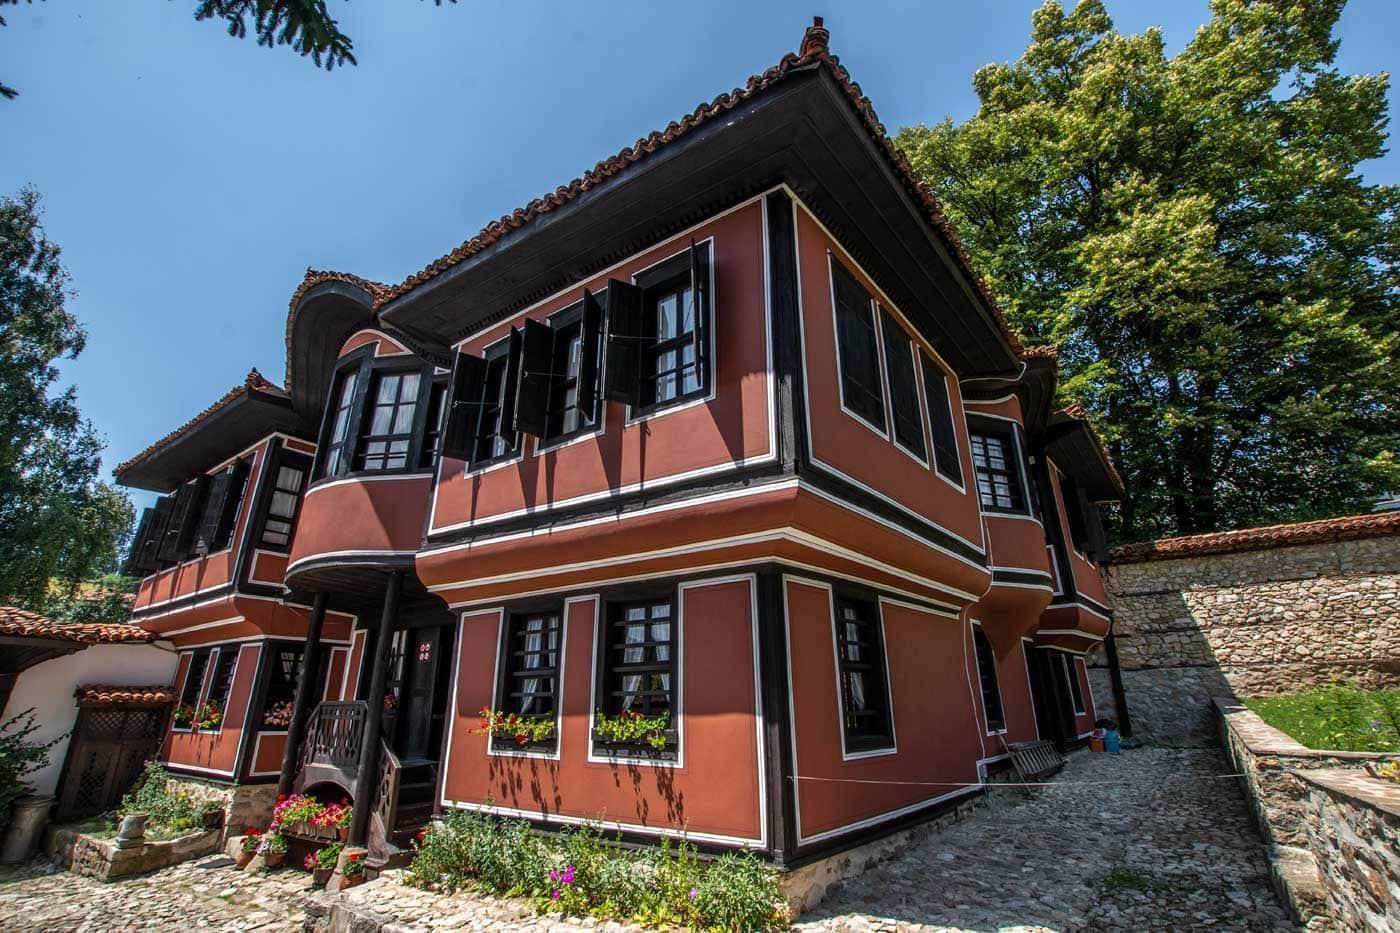 what to see in koprivshtitsa - kableshkov house